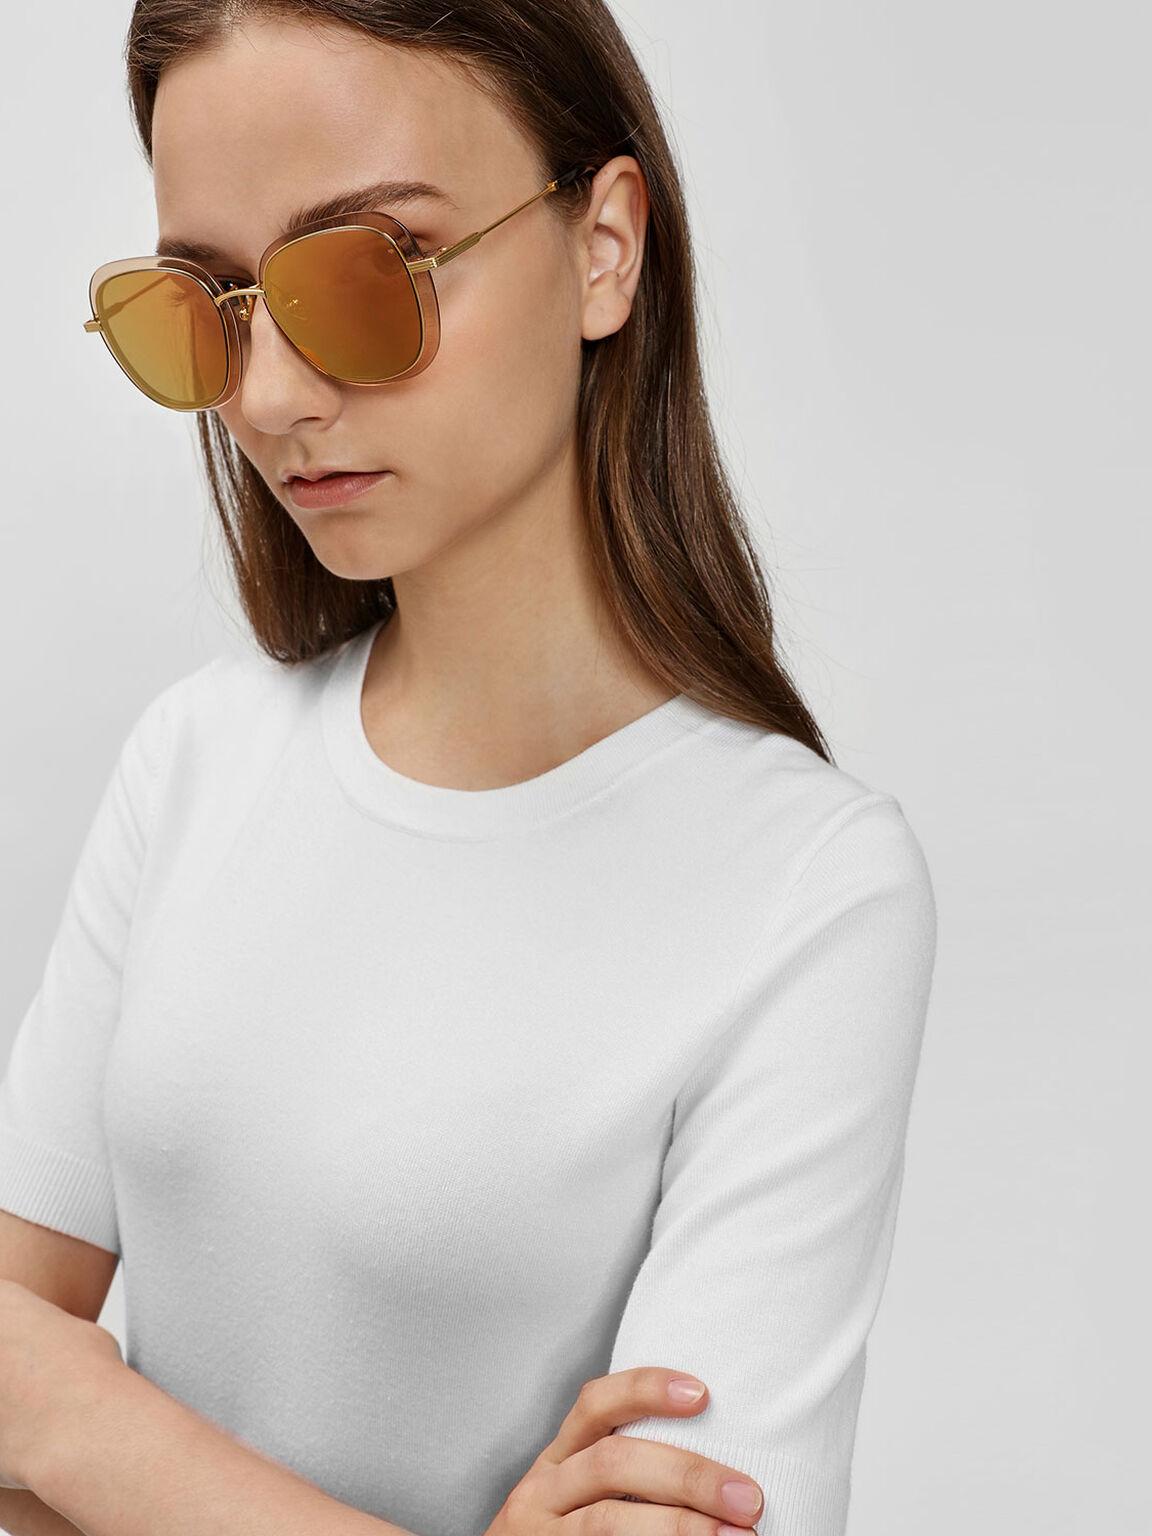 Double Lens Sunglasses, Gold, hi-res